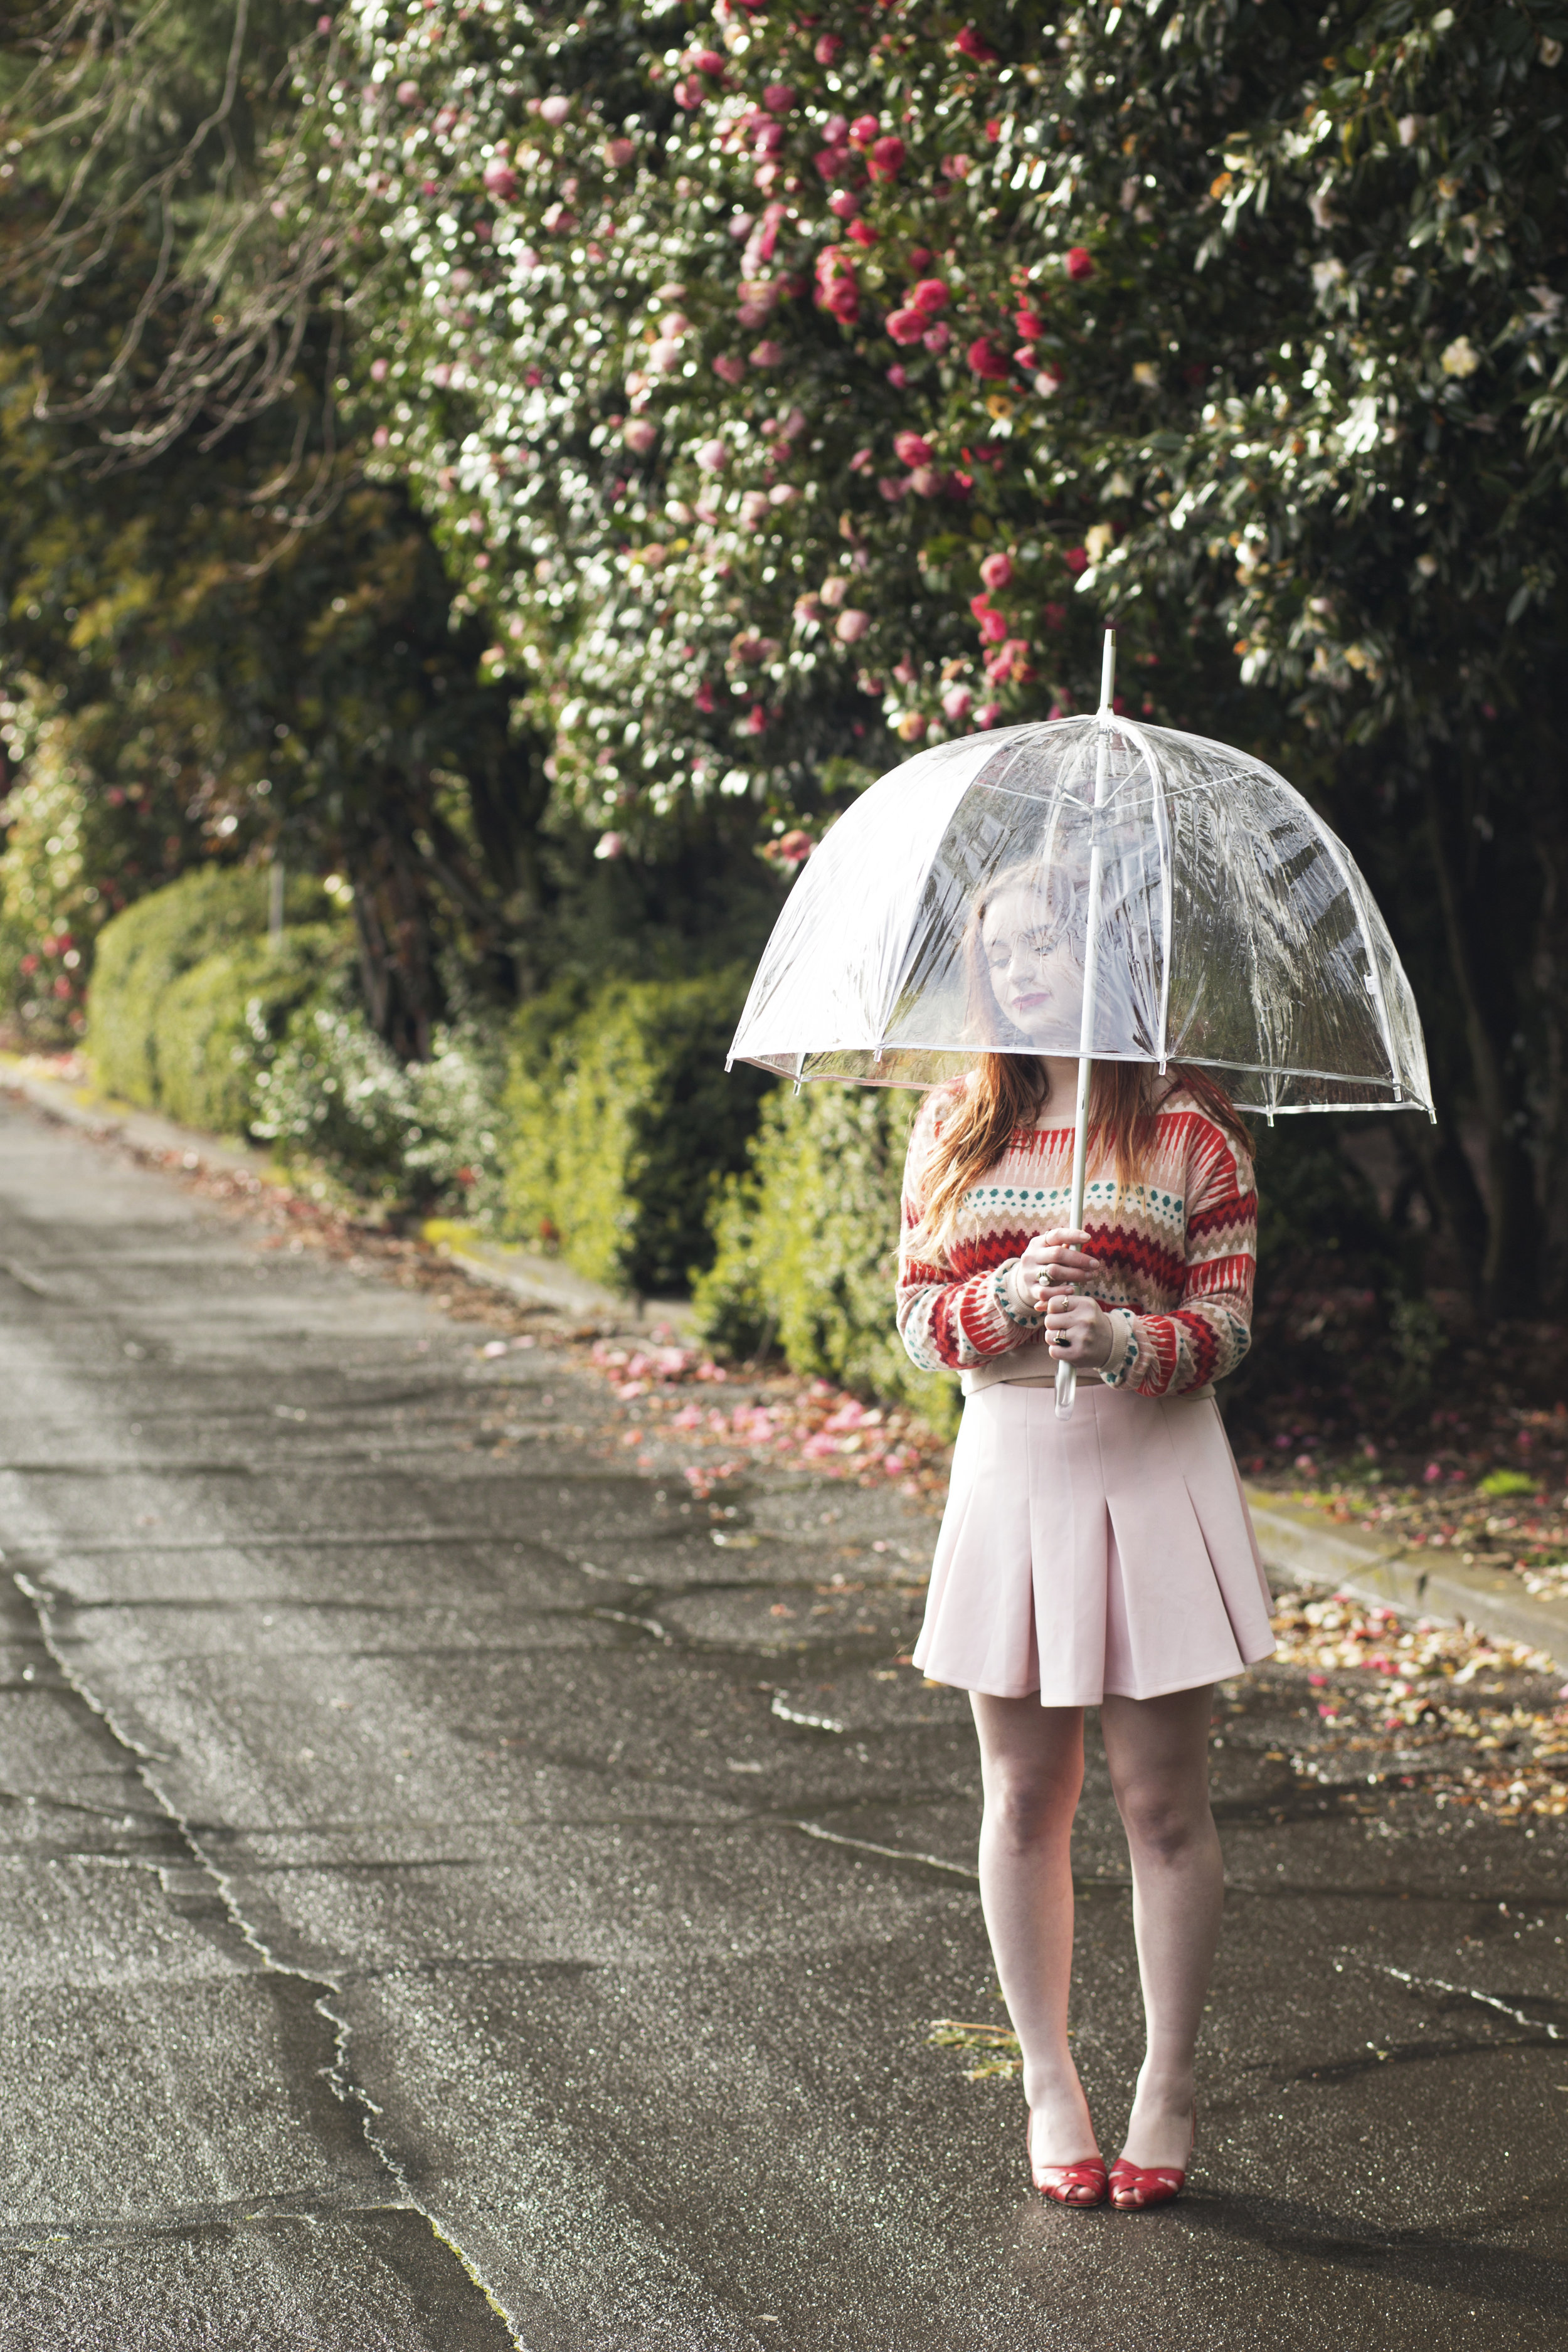 Rainy day photo session at Laurelhurst Park.